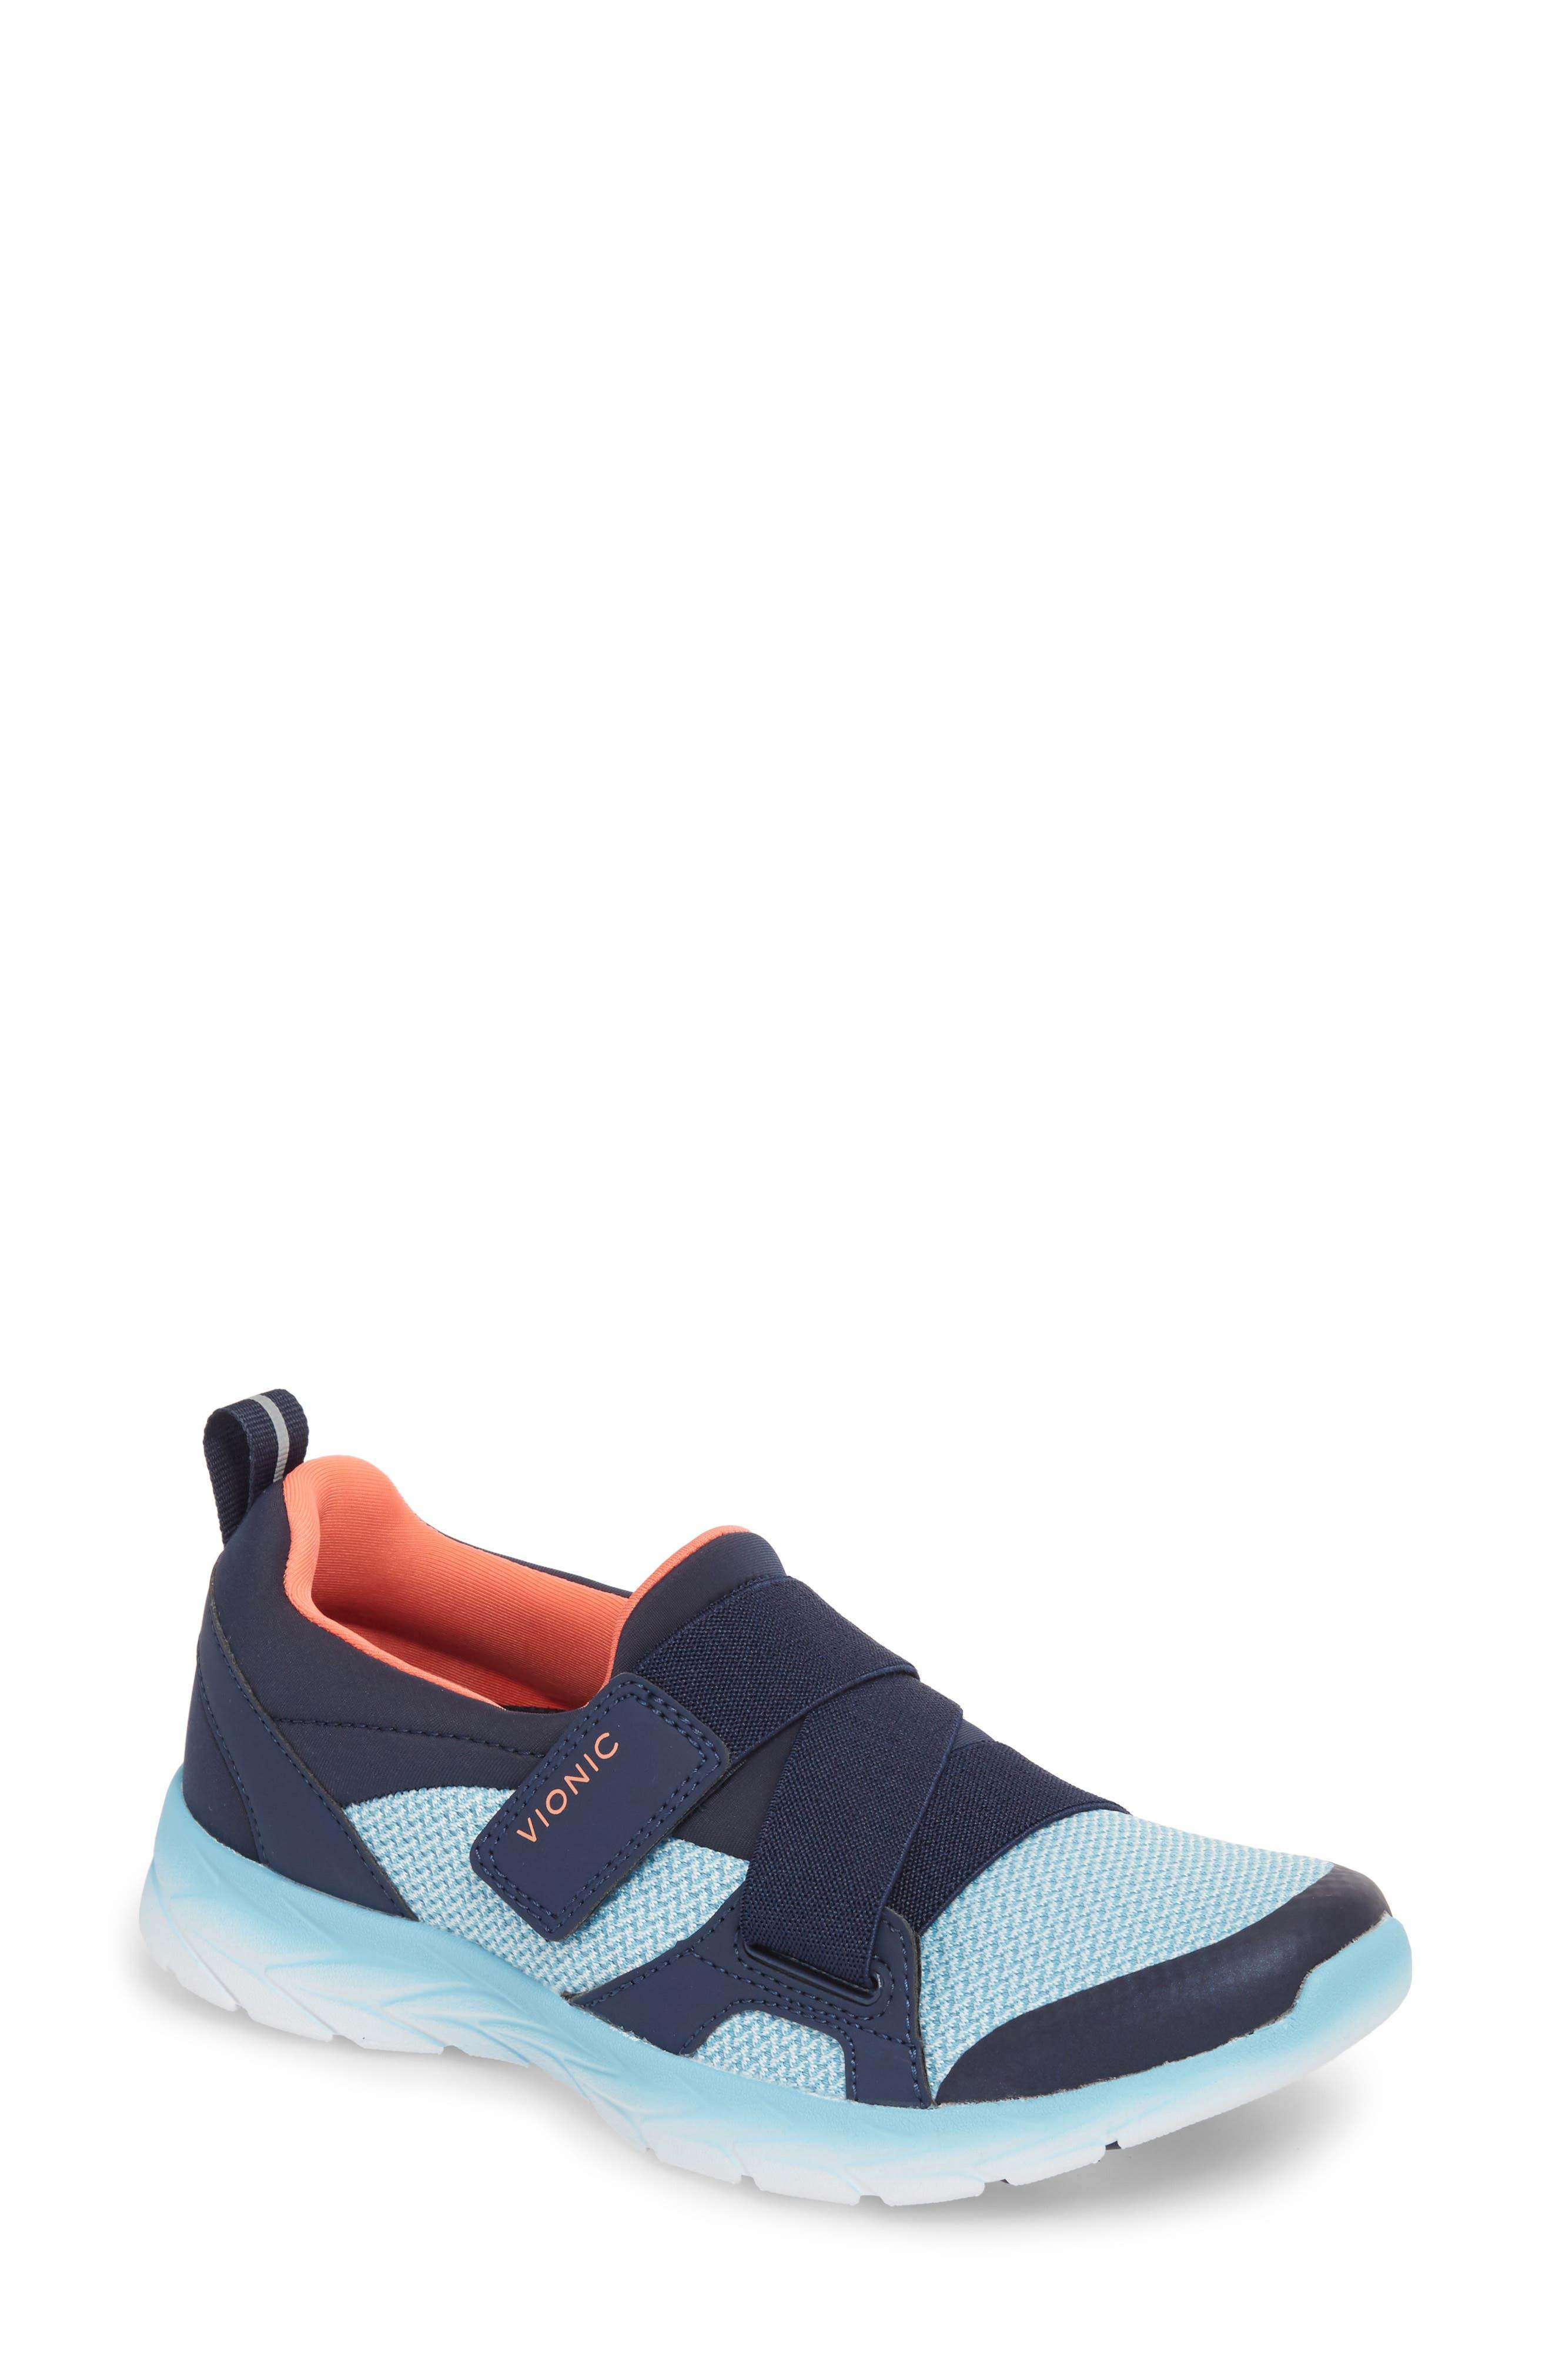 Dash Sneaker,                             Main thumbnail 1, color,                             Navy/ Light Blue Fabric